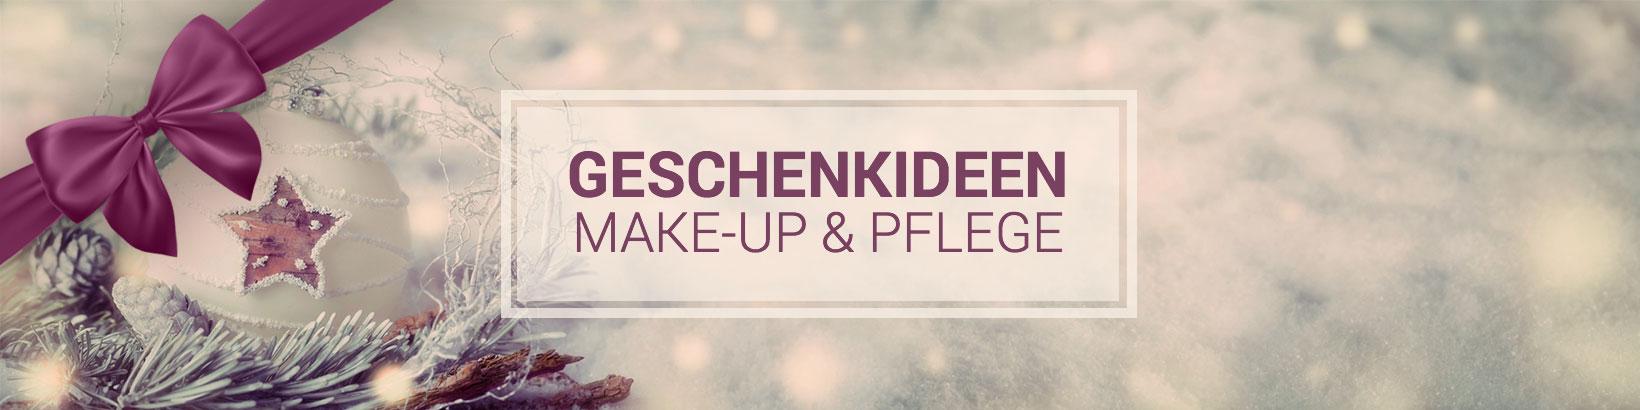 Visual-Weihnachent-Geschenke-Damen-MakeUp-1640x410